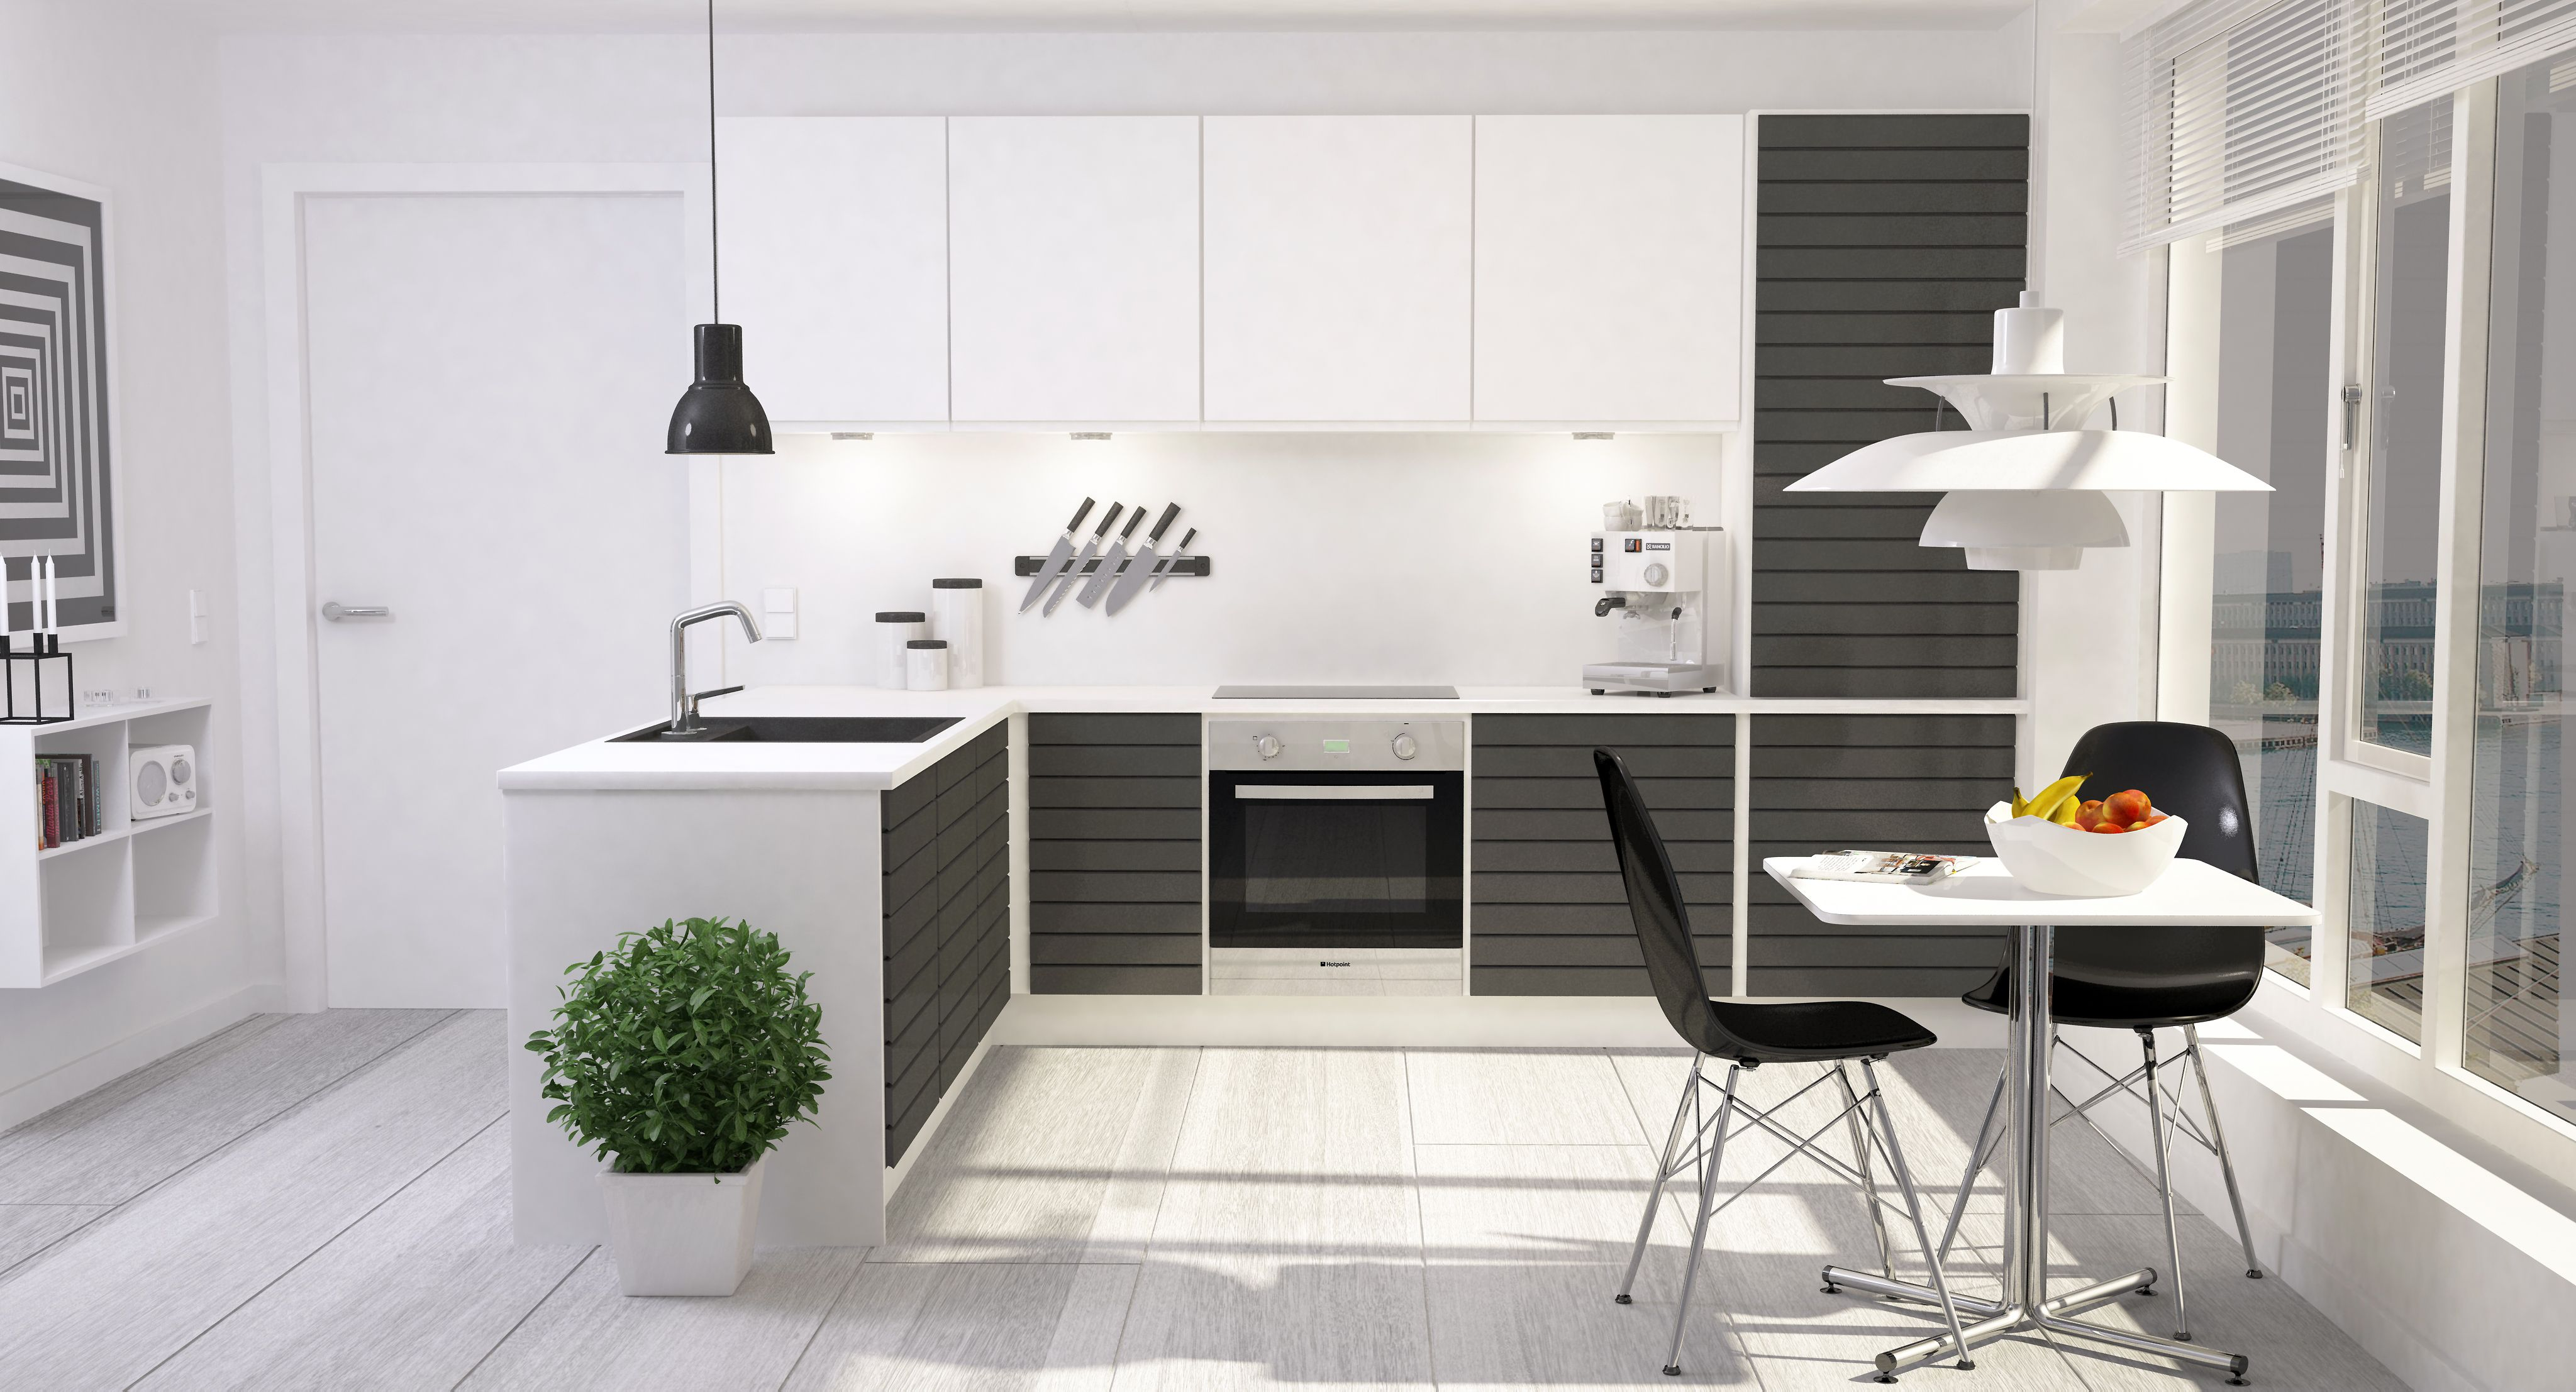 super modern and clean is always an option | Interior Design Ideas ...